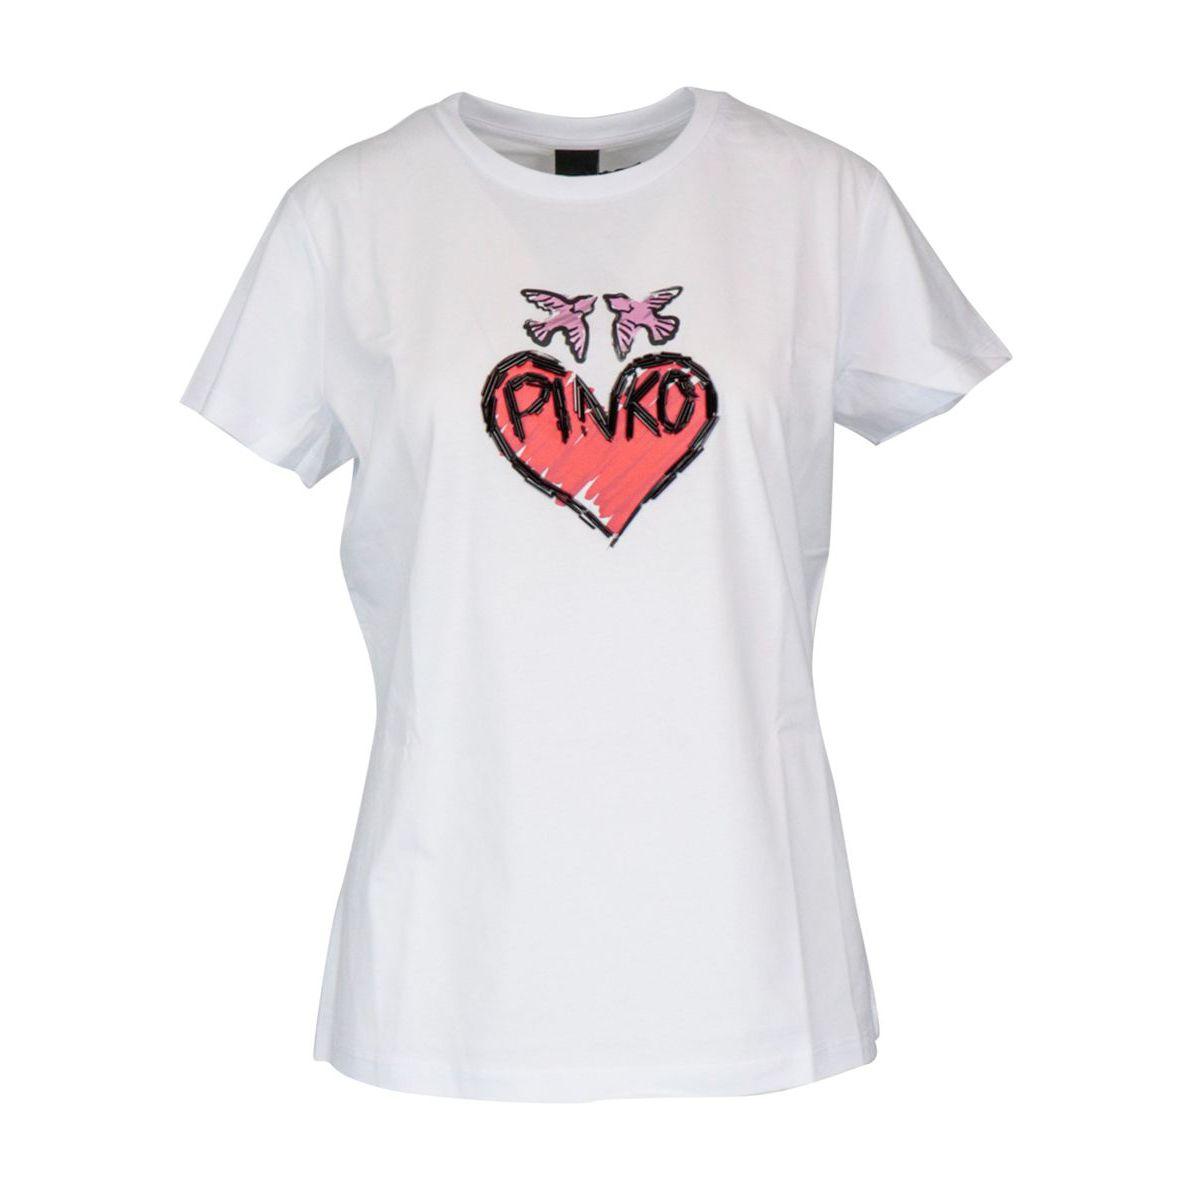 Sallie cotton T-shirt with logo and beads print White Pinko